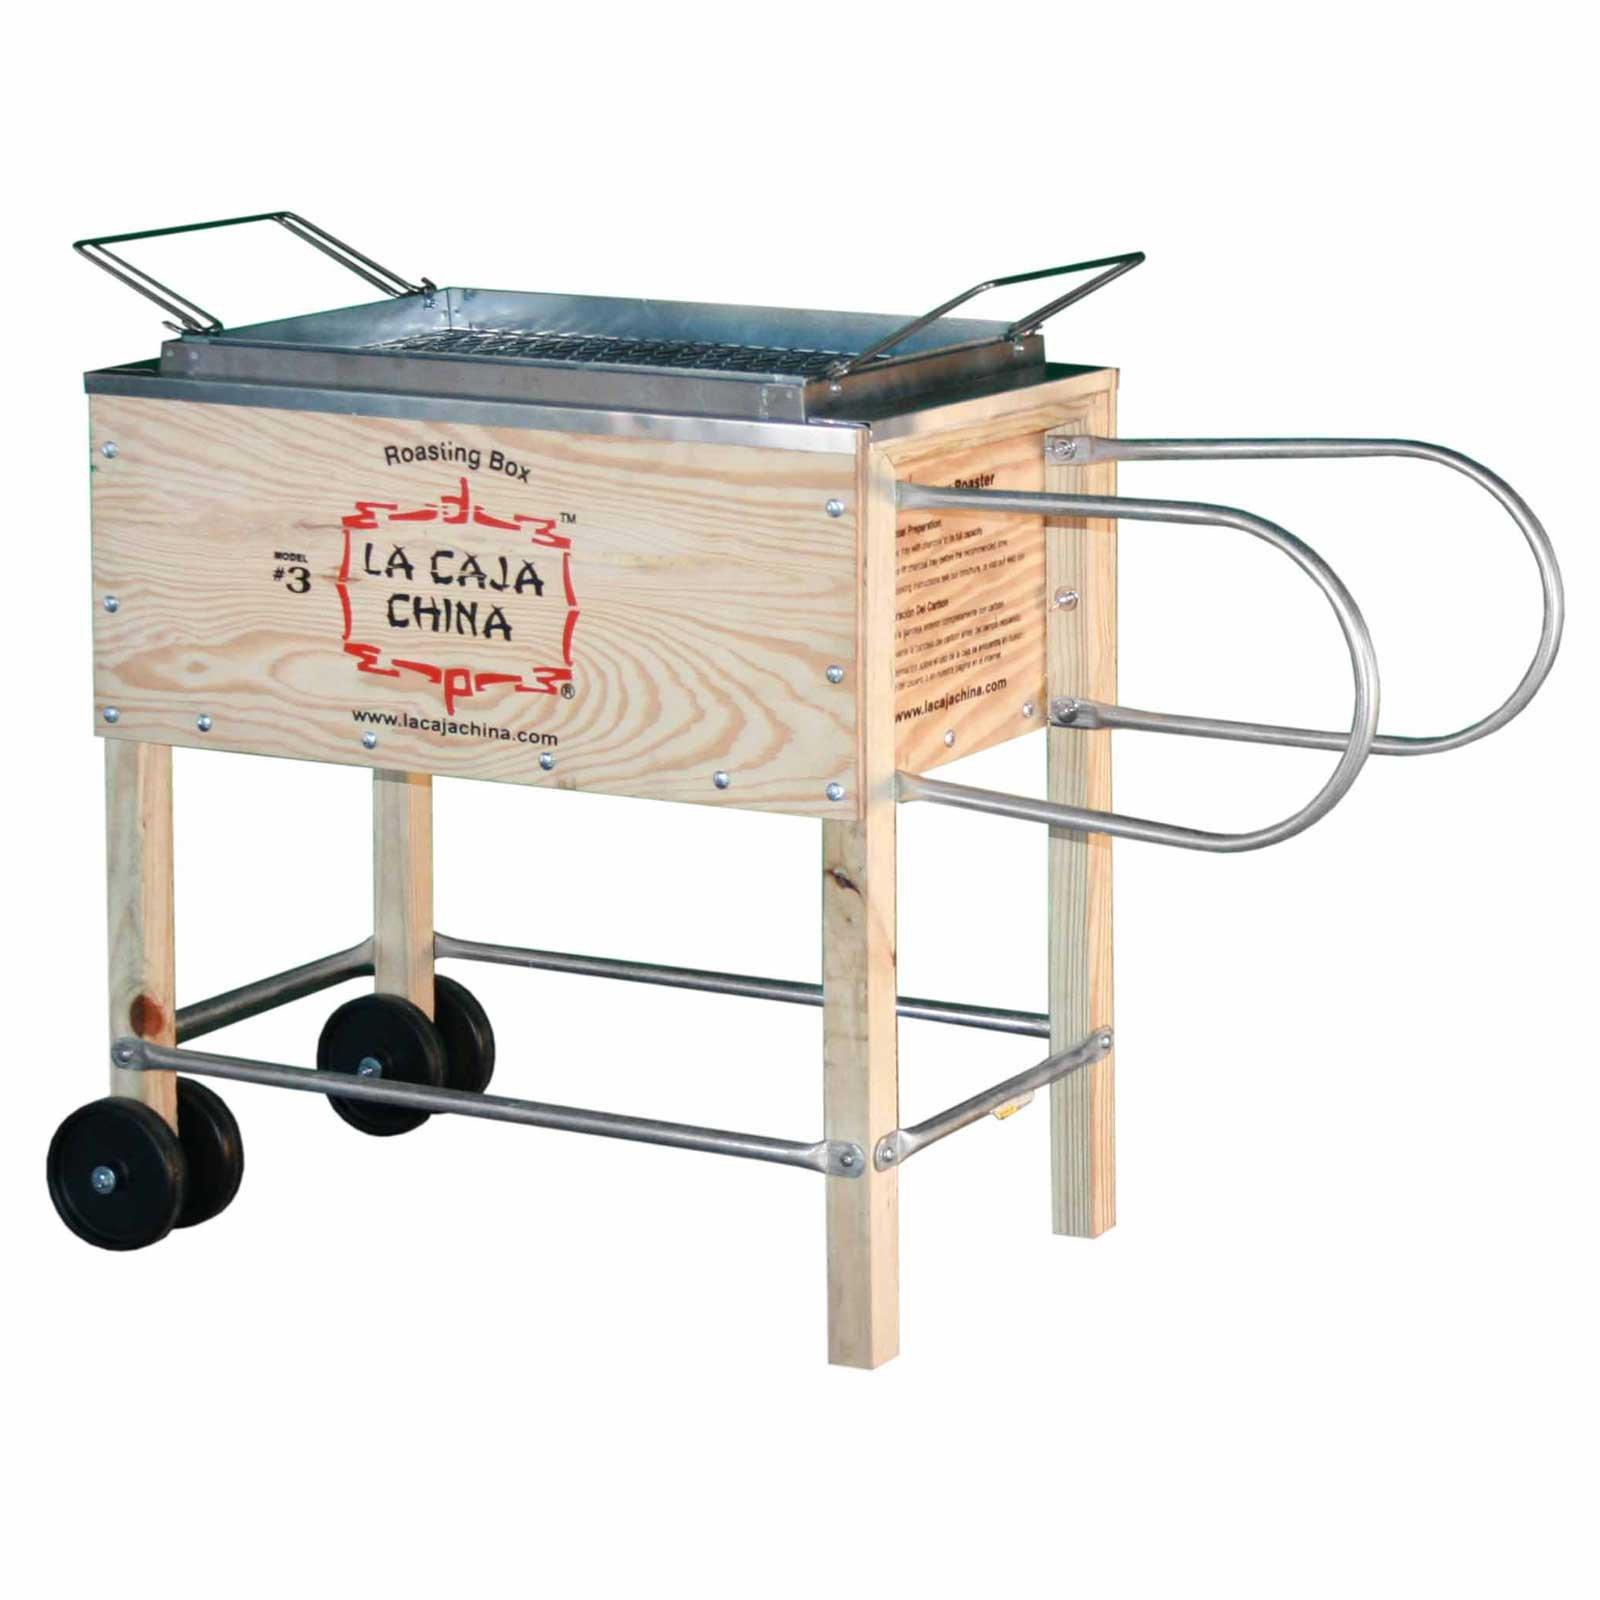 La caja china Cajas Sau # 3 Roasting Caja cerdo Barbacoa: Amazon ...